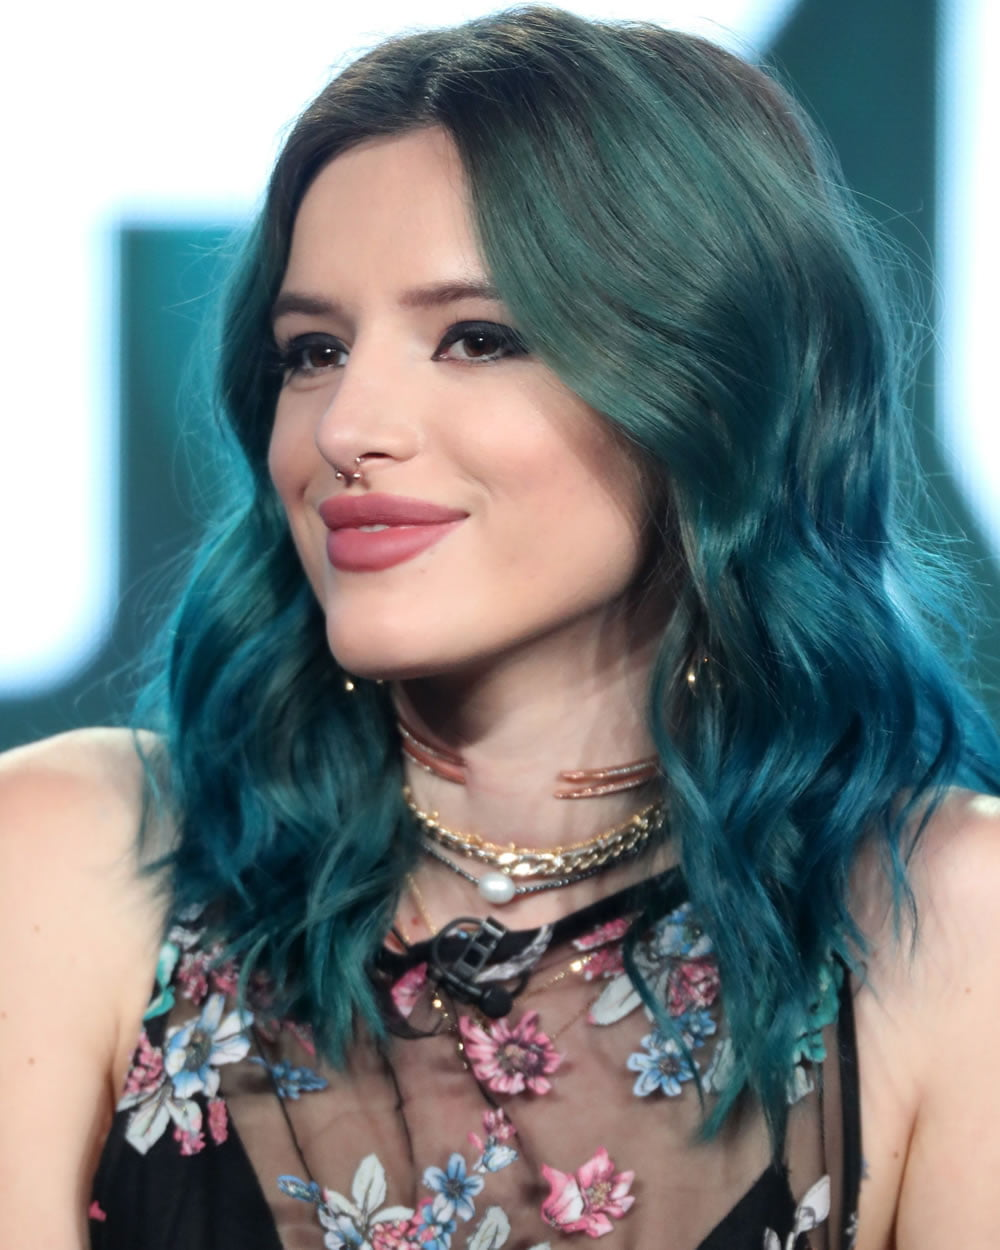 2018 Medium Haircuts for Attractive Woman - Medium Lenght Hair Cut Image